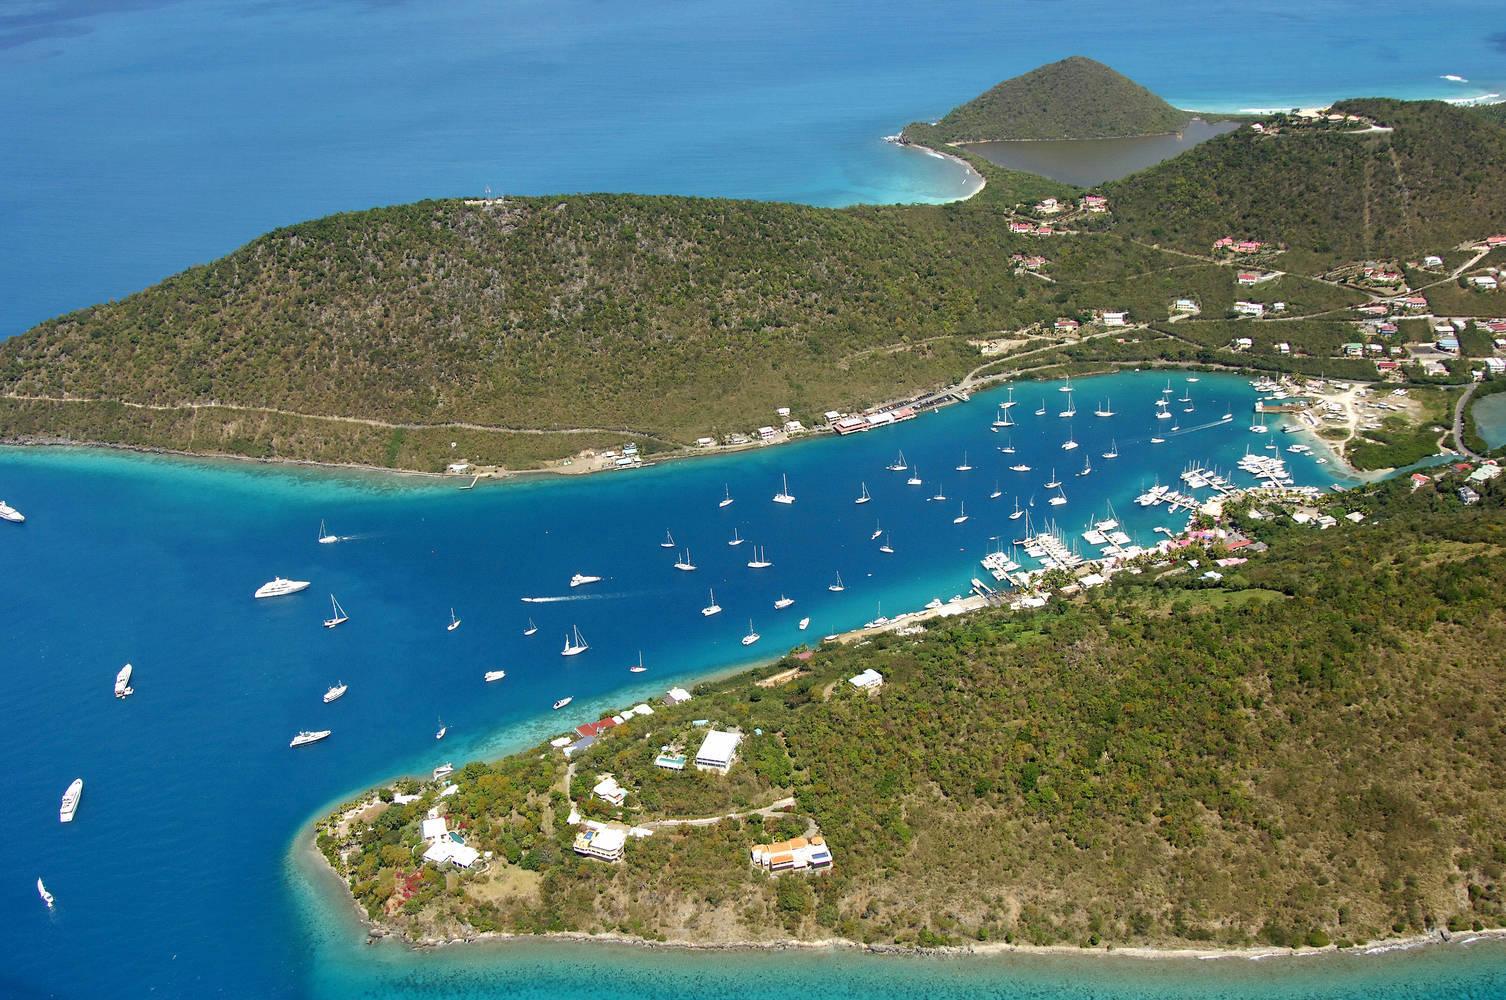 Sopers Hole Harbor in Tortola, British Virgin Islands - harbor Reviews -  Phone Number - Marinas.com